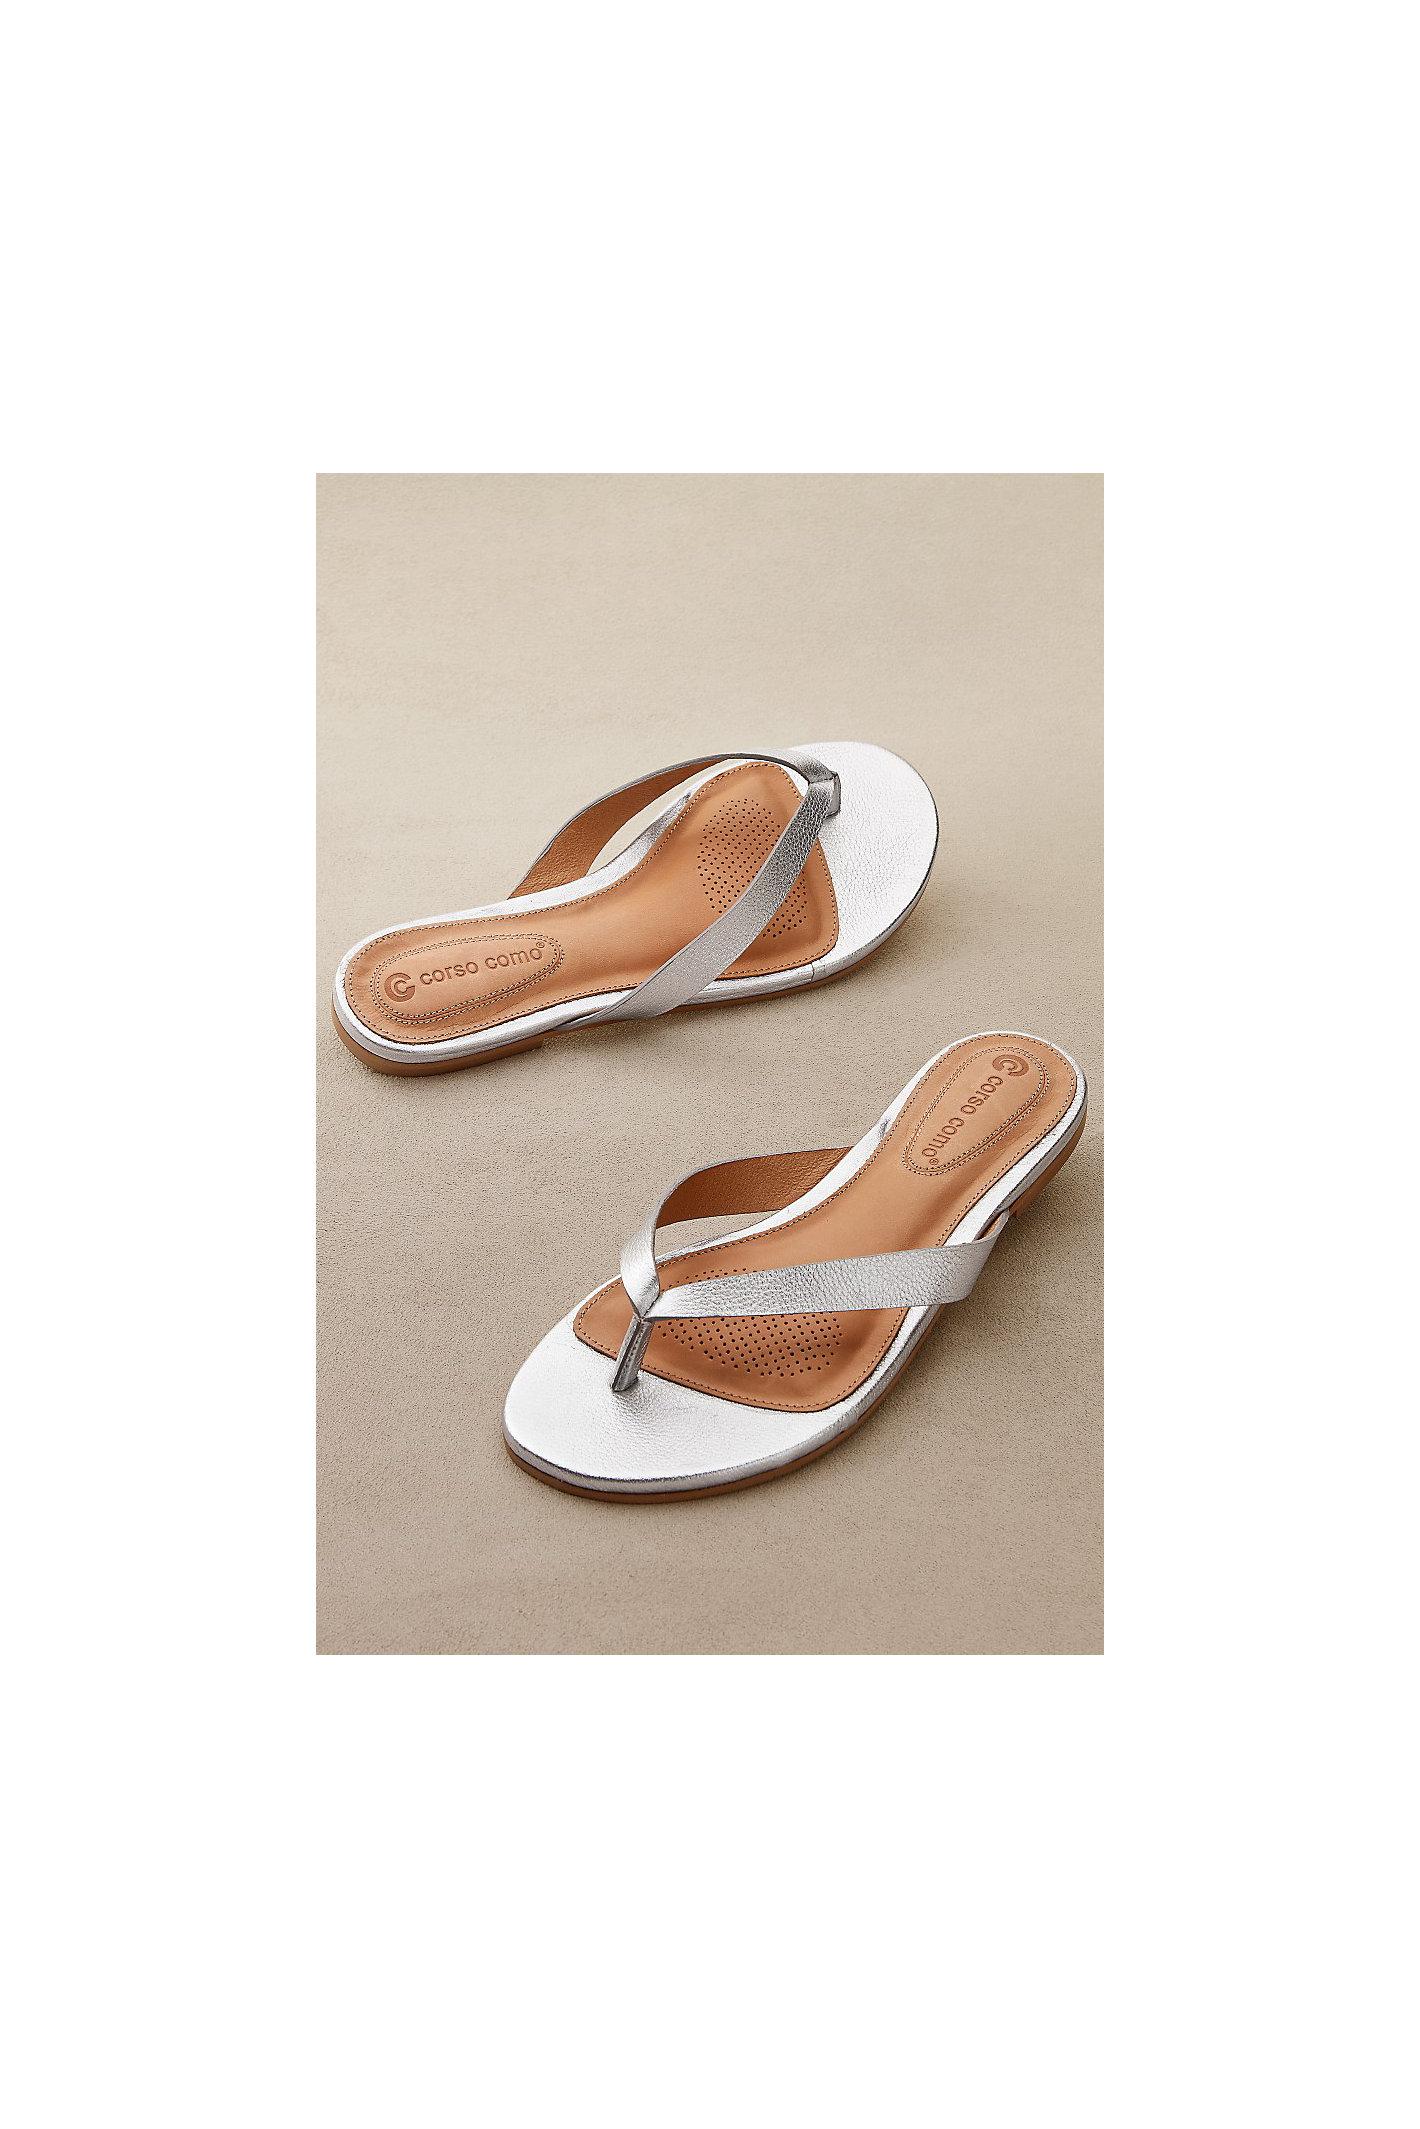 Leilani Sandals